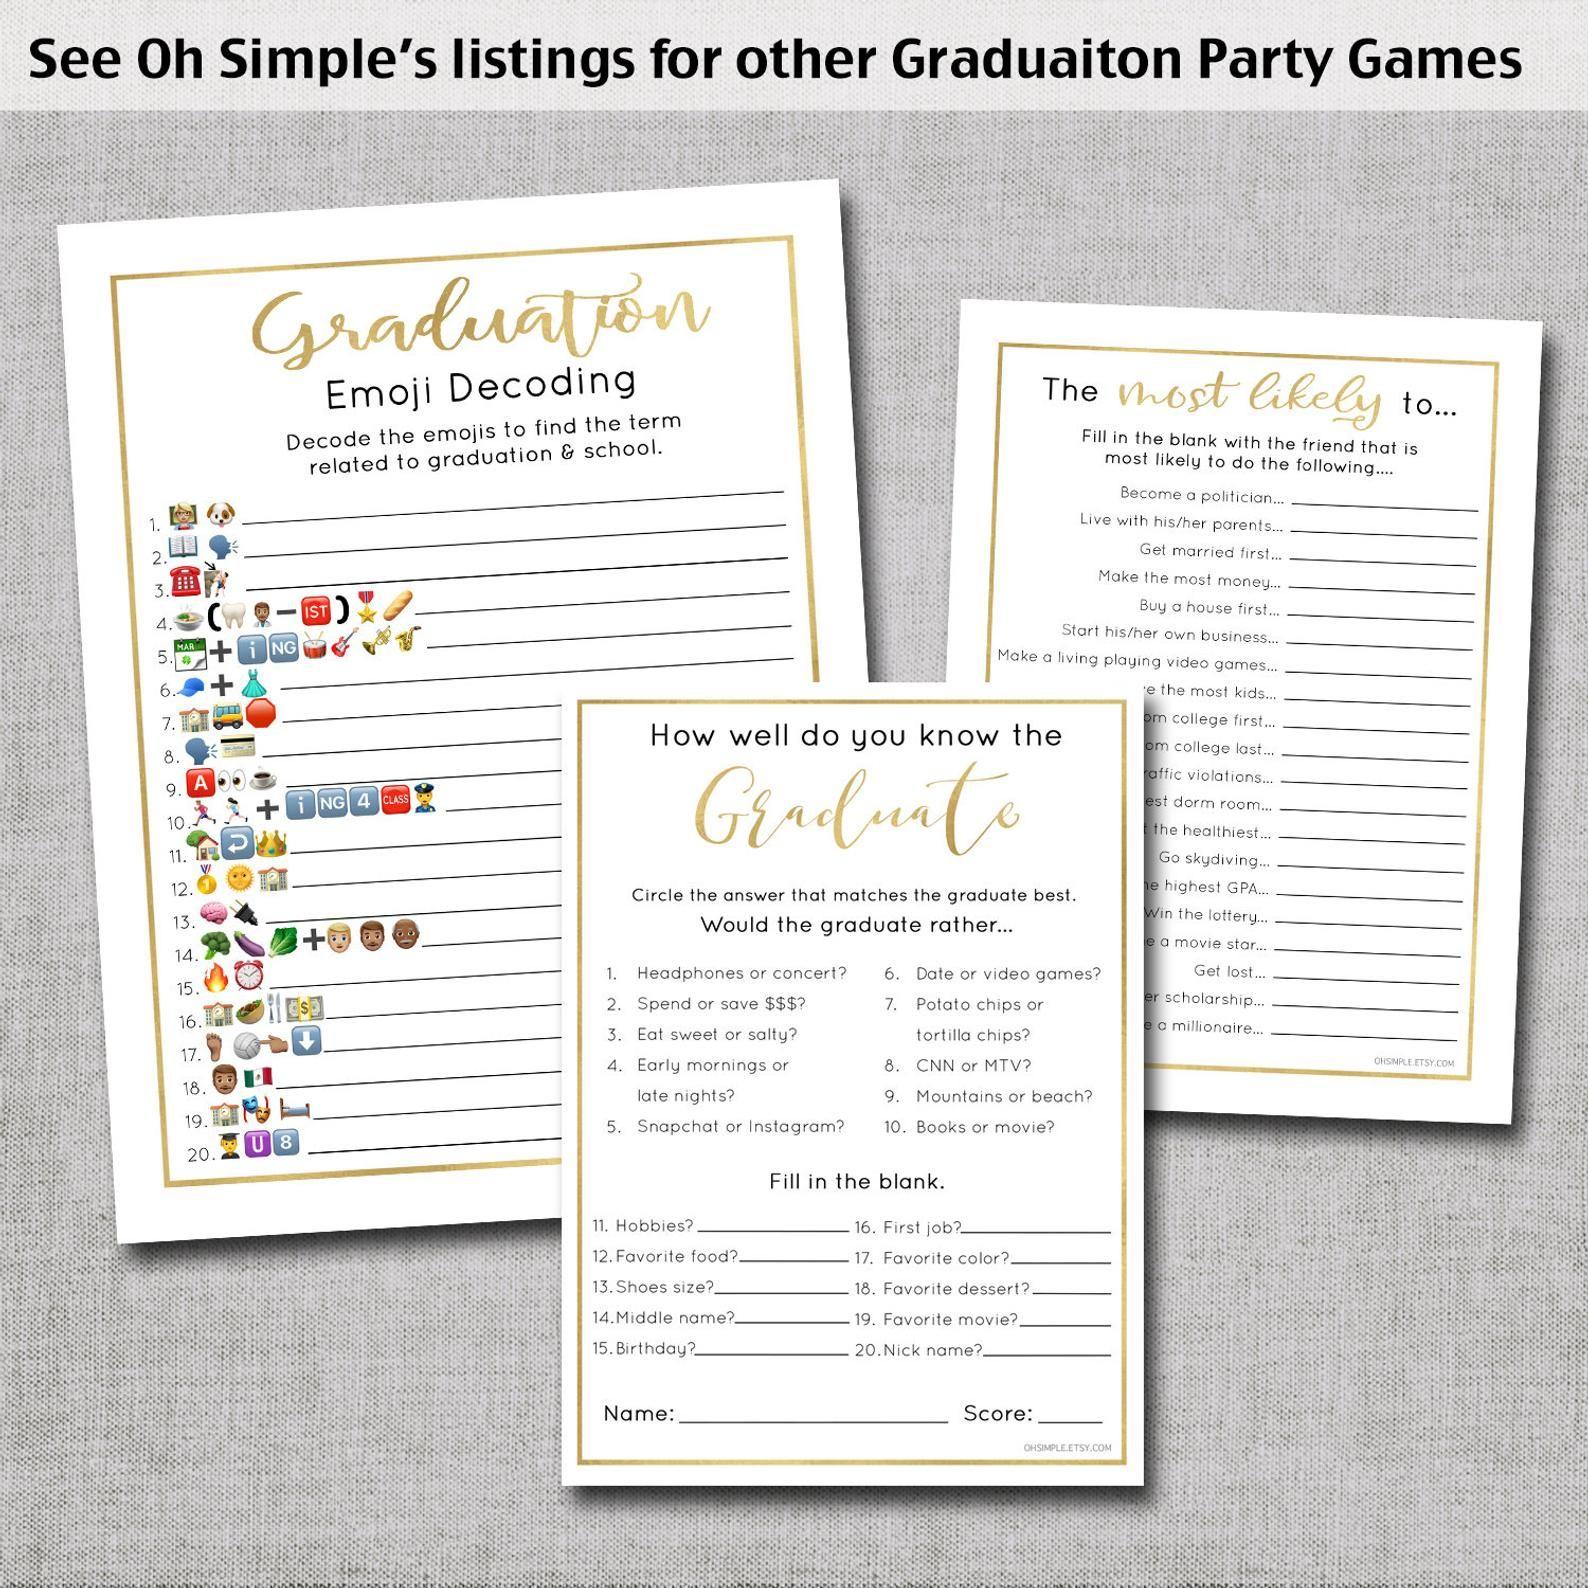 Graduation Games Graduation Party Decorations Emoji Etsy In 2020 Graduation Party Games Graduation Games Graduation Party Decor